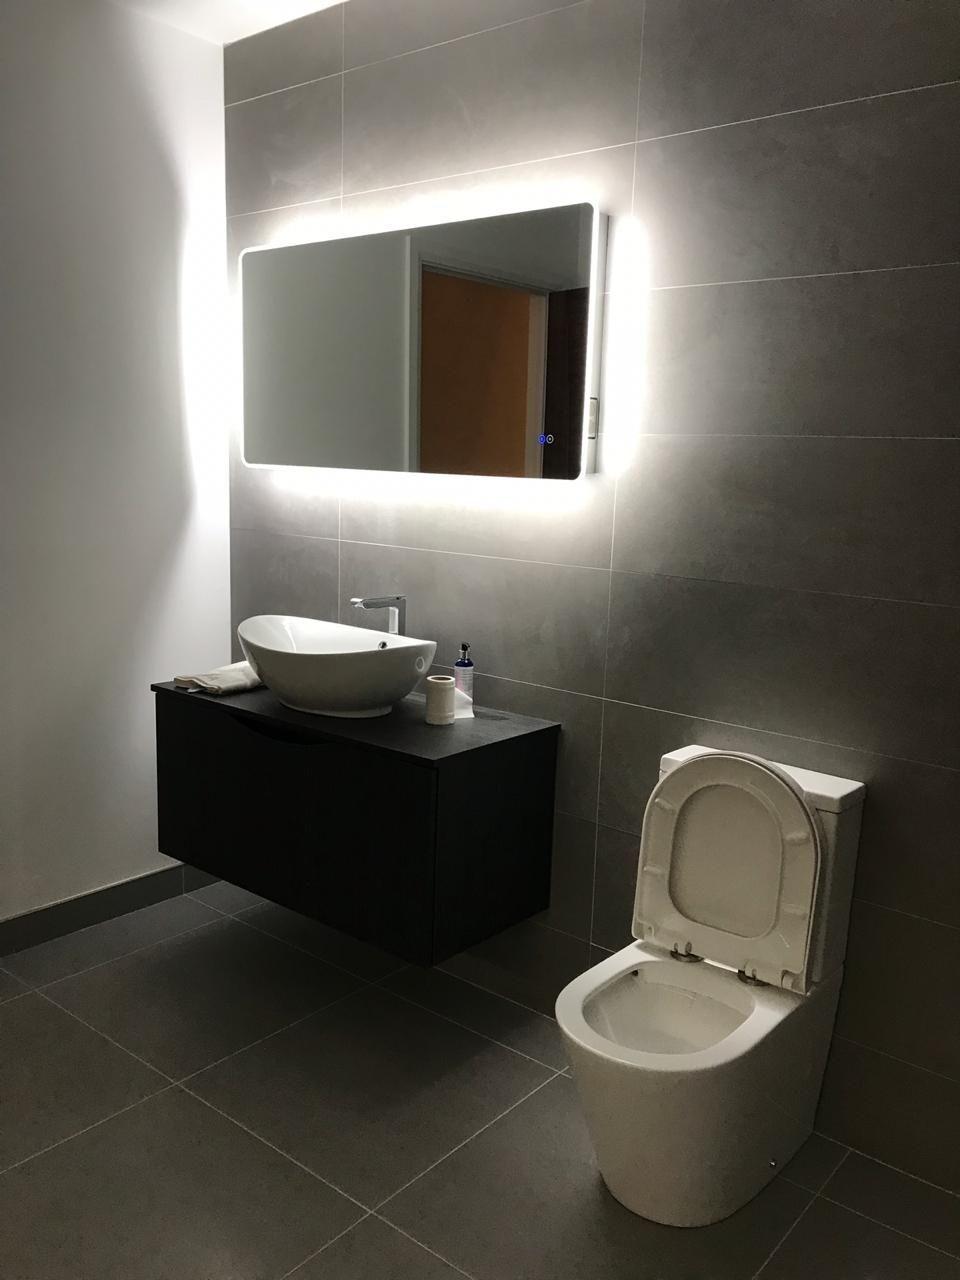 Beautiful Customer Bathroom Supplied By Bathshack In Dublin Bathroomdesigndublin Bathroom Design Bathroom Interior Design Small Half Bathrooms